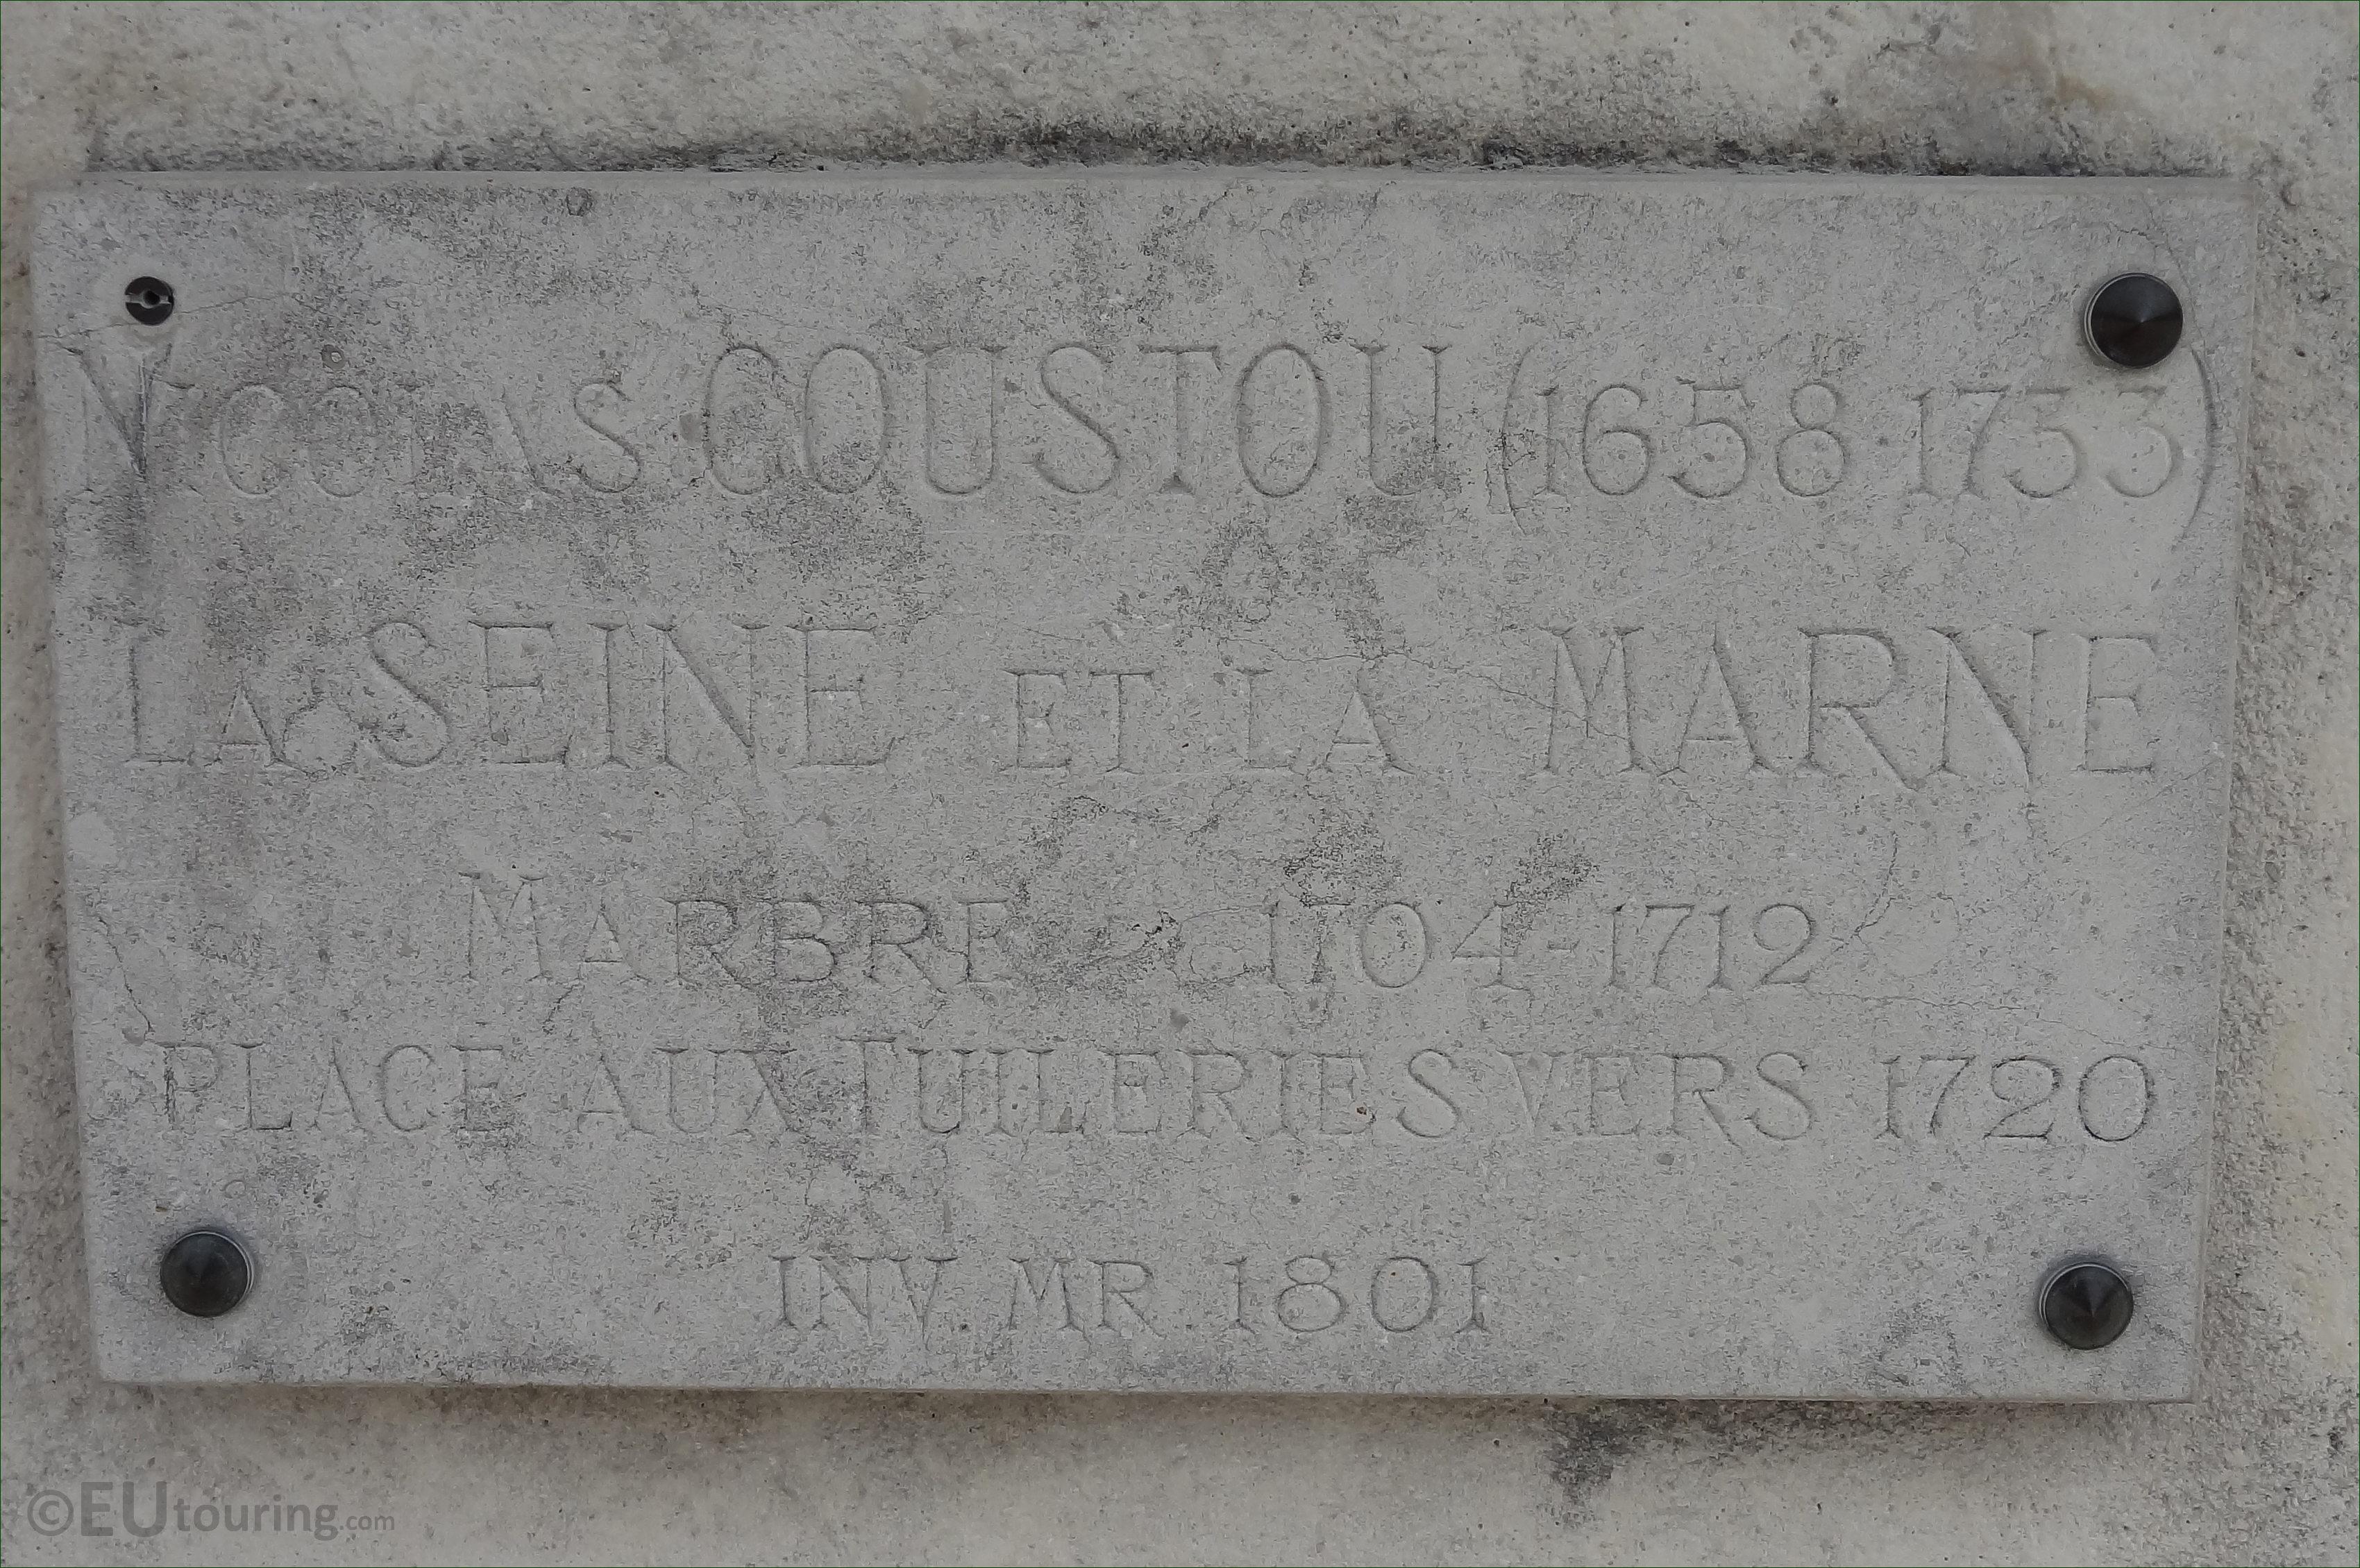 La seine et la marne statue in tuileries gardens paris - Vide greniers seine et marne ...